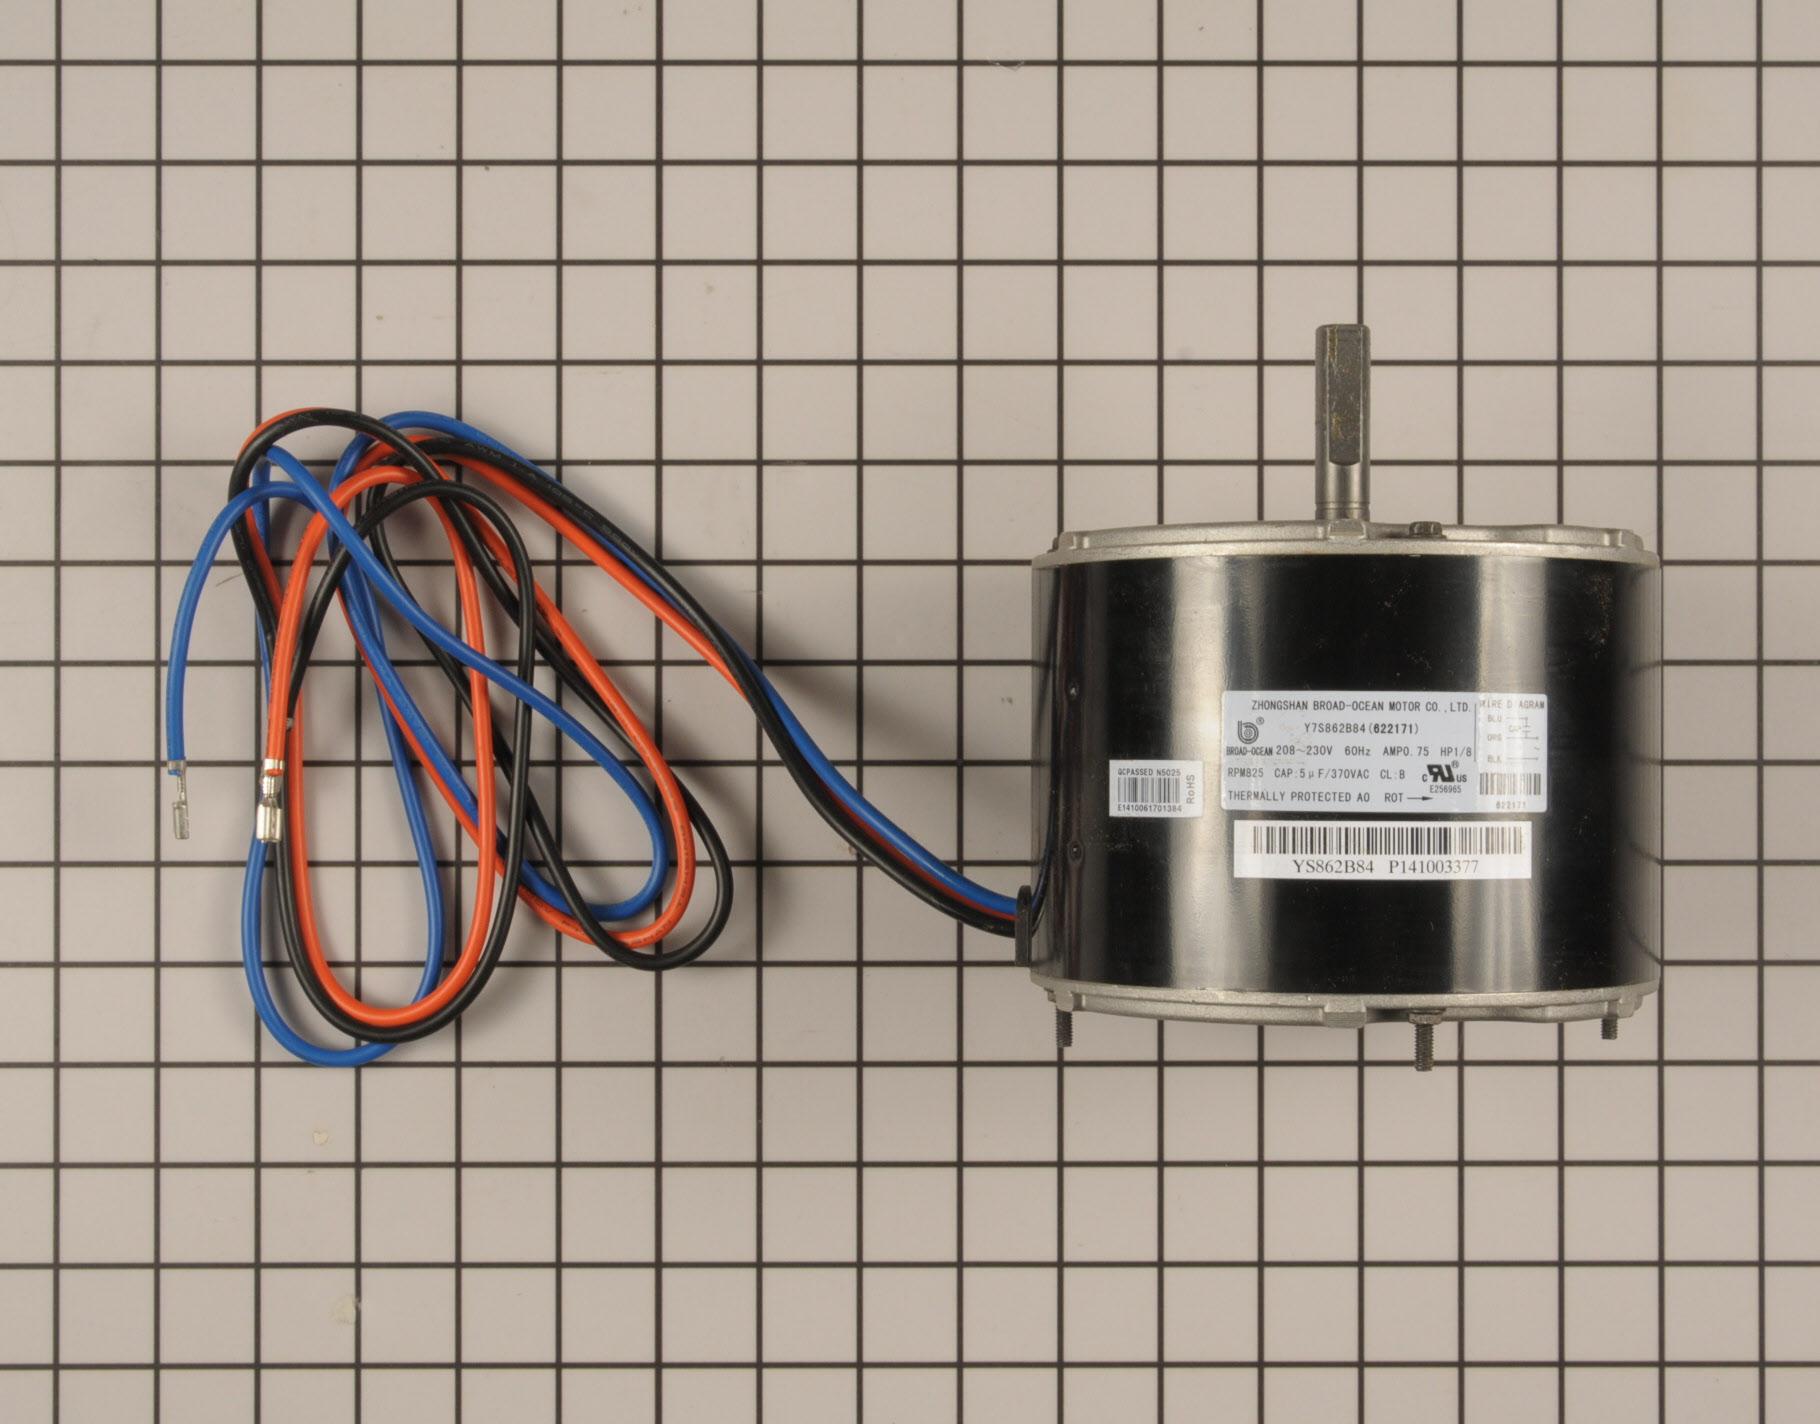 Frigidaire Central Air Conditioner Part # 622171 - Condenser Fan Motor